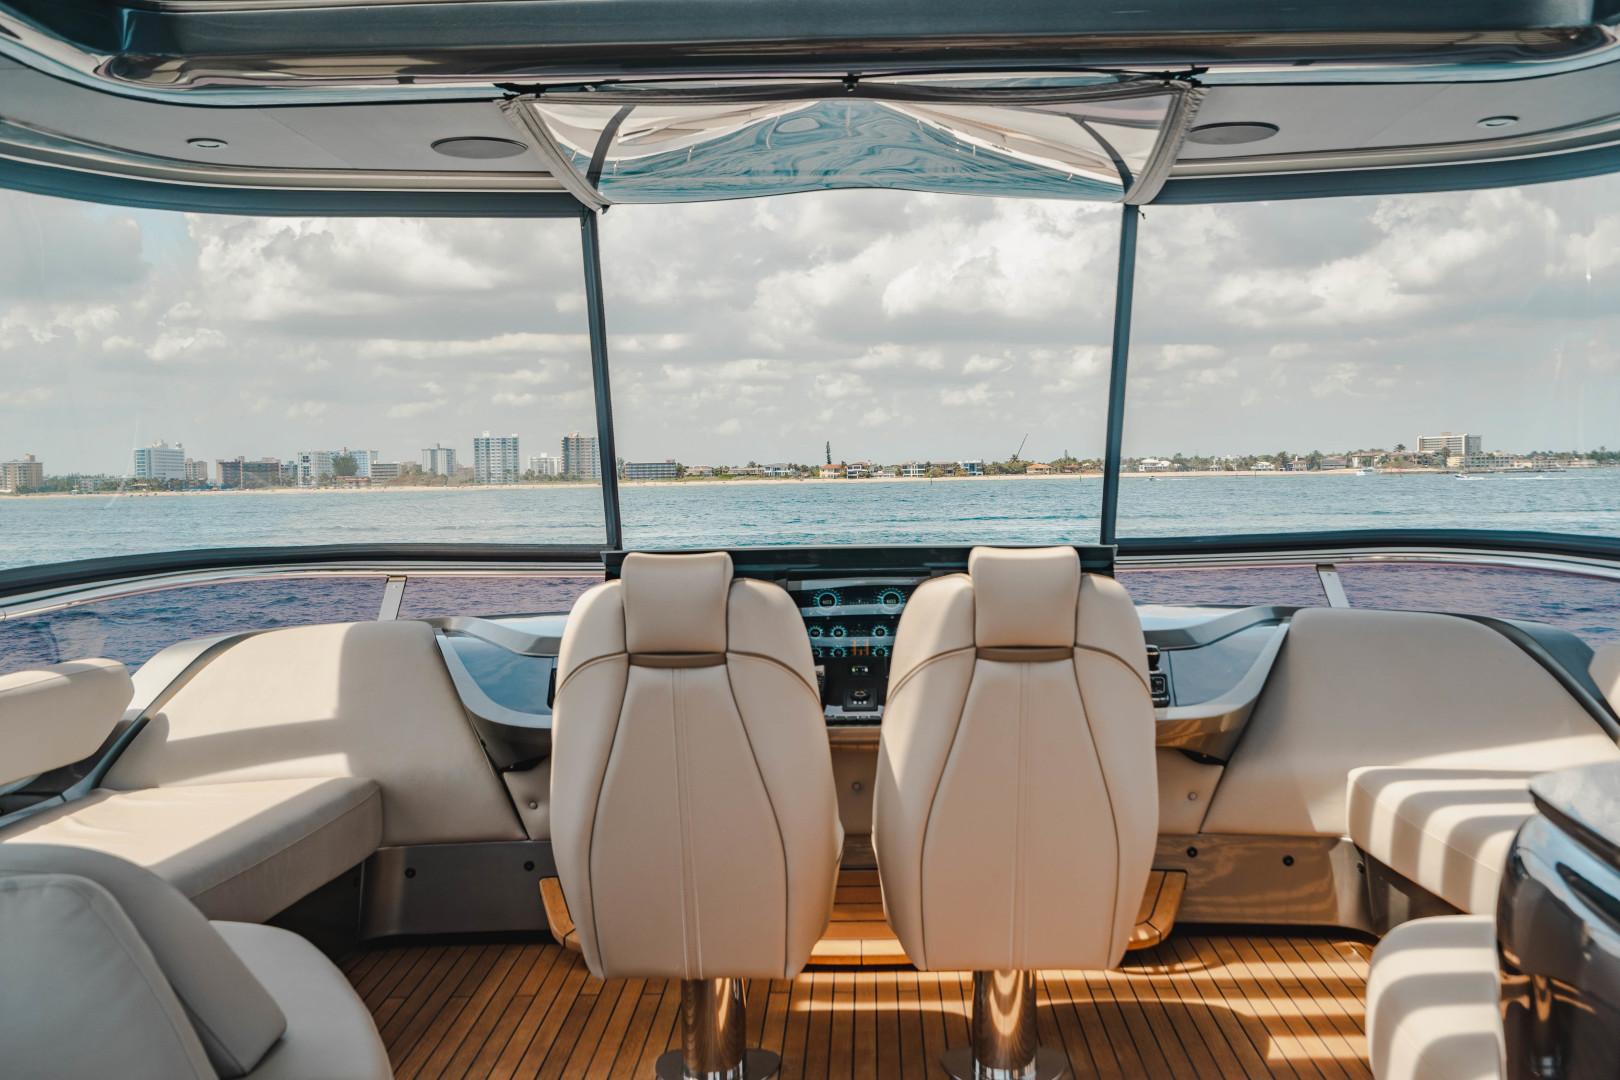 Princess-Y85  2019-Splash Delray Beach-Florida-United States-1631644 | Thumbnail